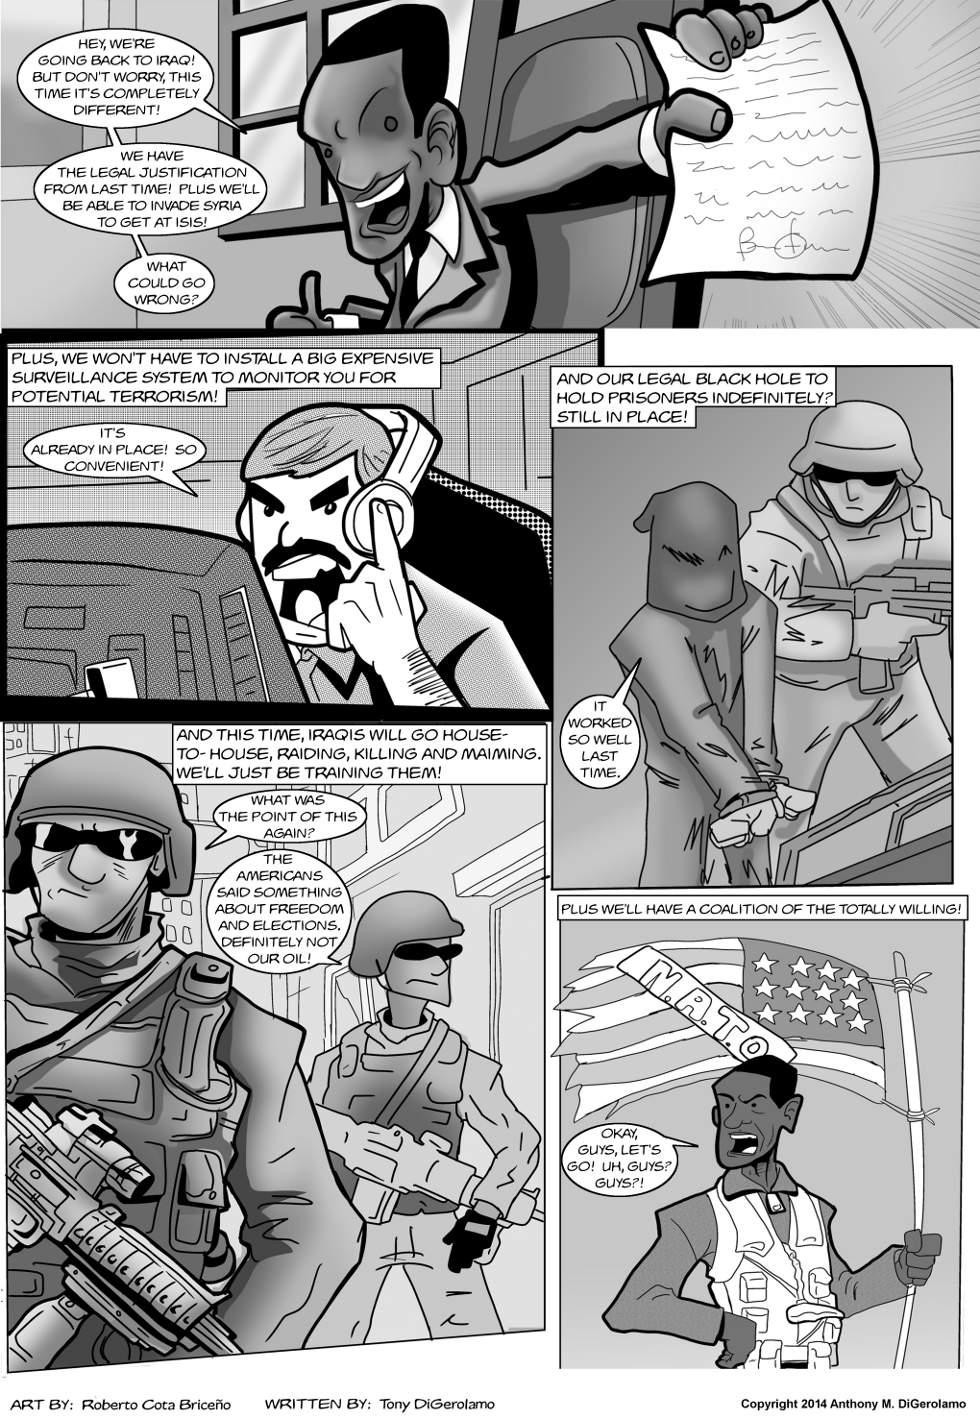 The Antiwar Comic:  Back in Iraq